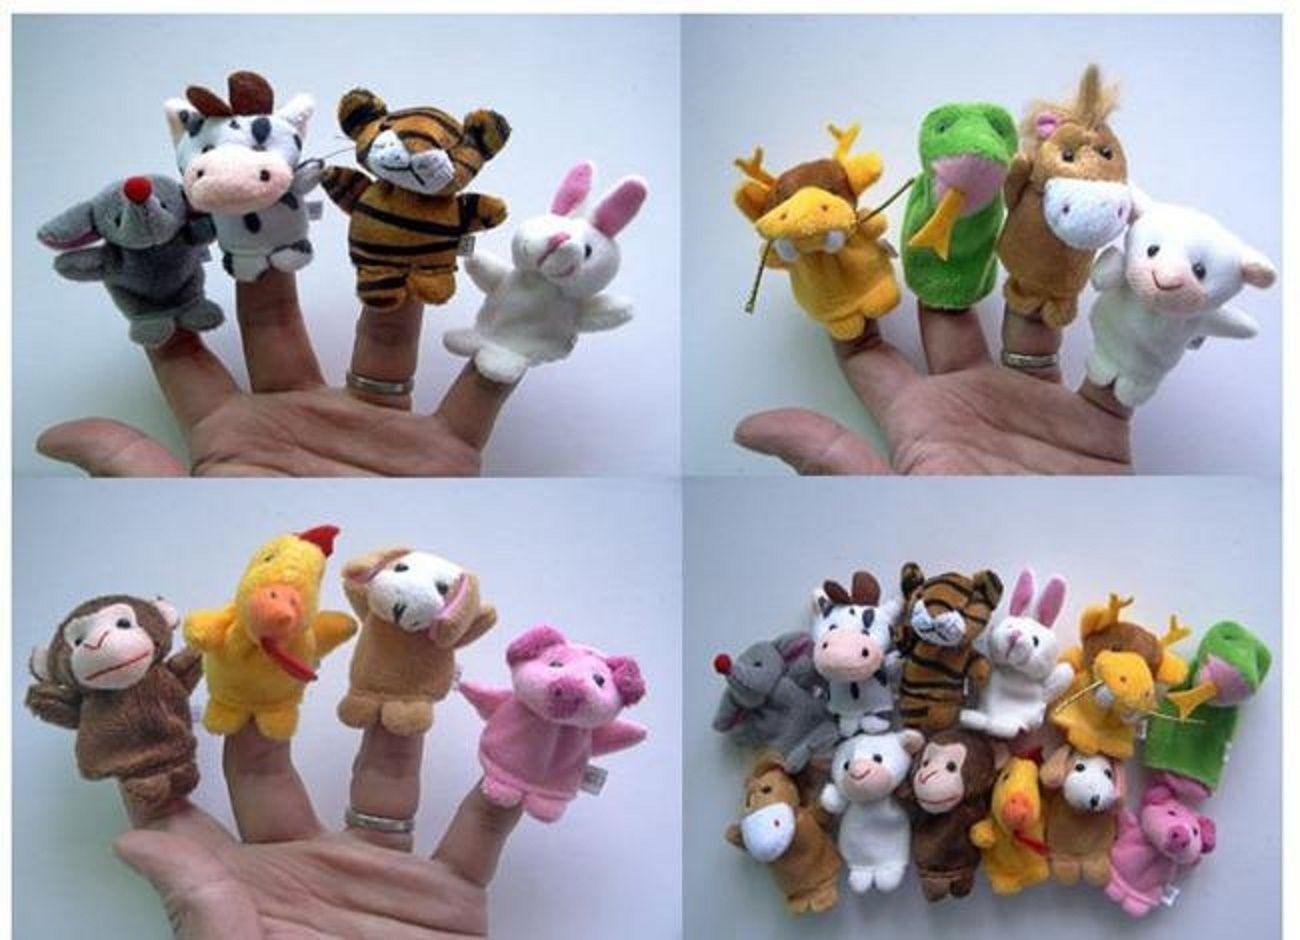 Soft Plush Velour Animal Hand Puppets Kids Animal Finger - 10 Pieces